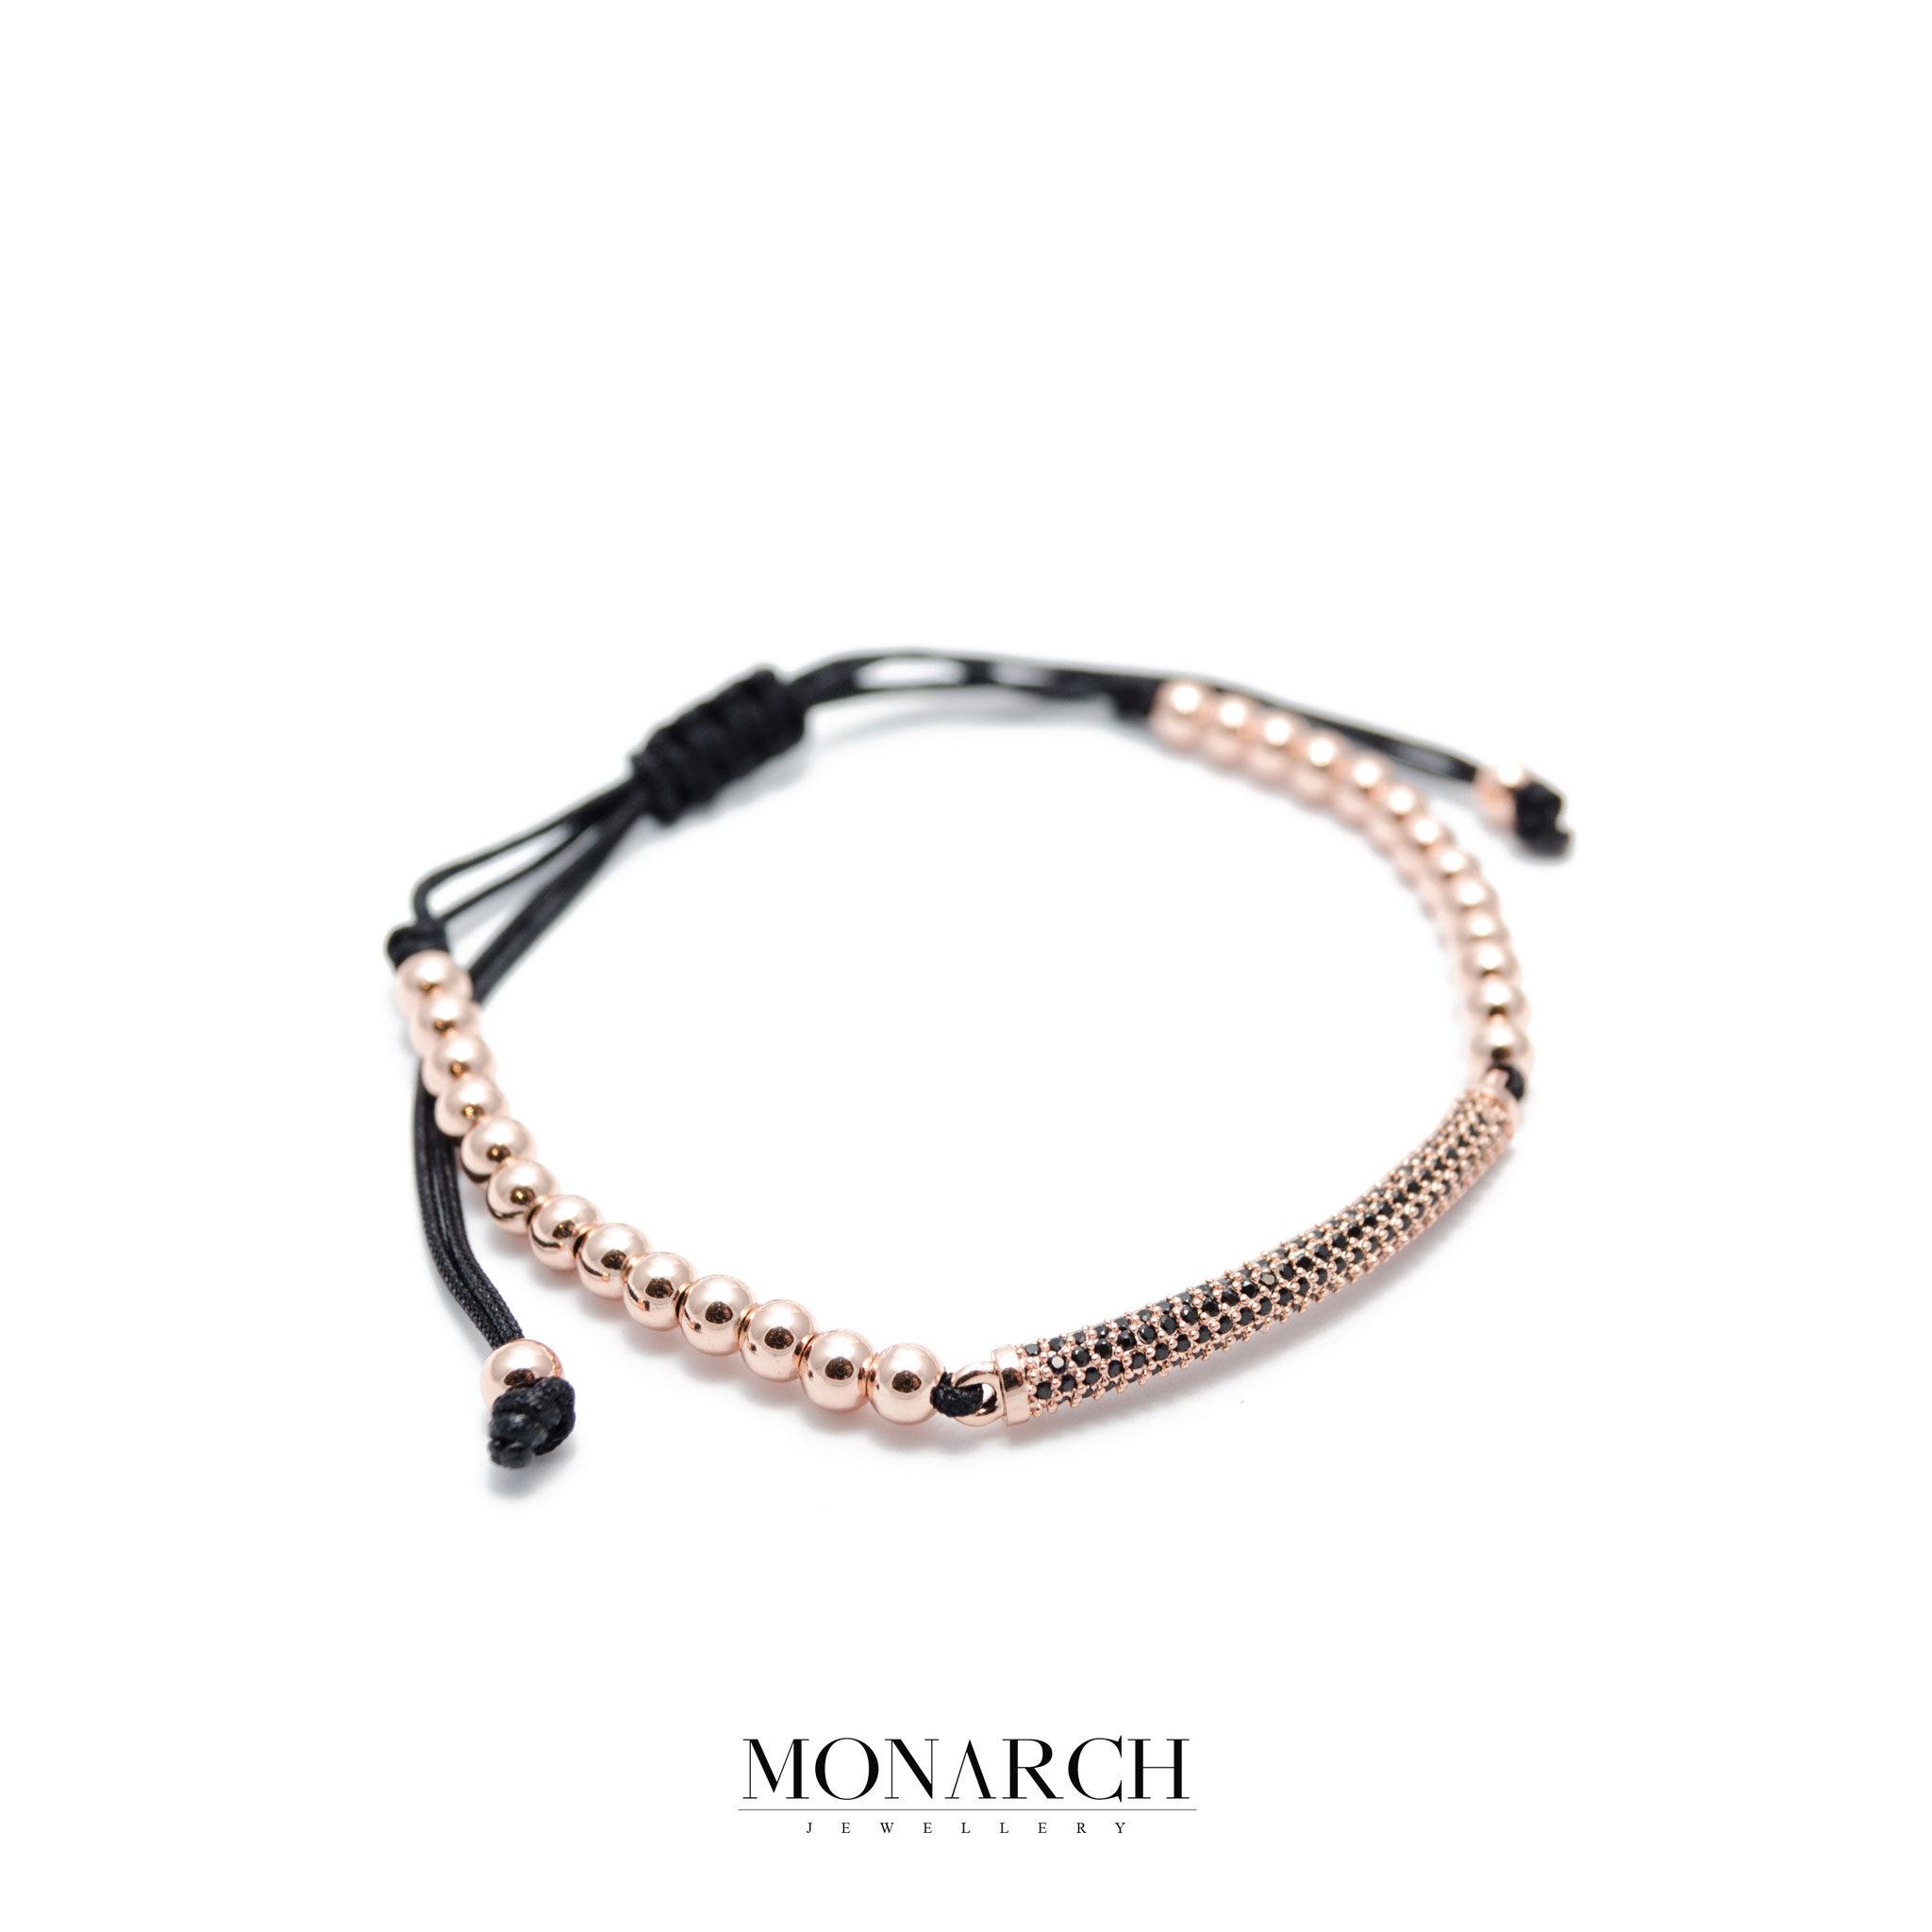 Monarch Jewellery 24K Gold Rose Black Charm Luxury Macrame Bracelet